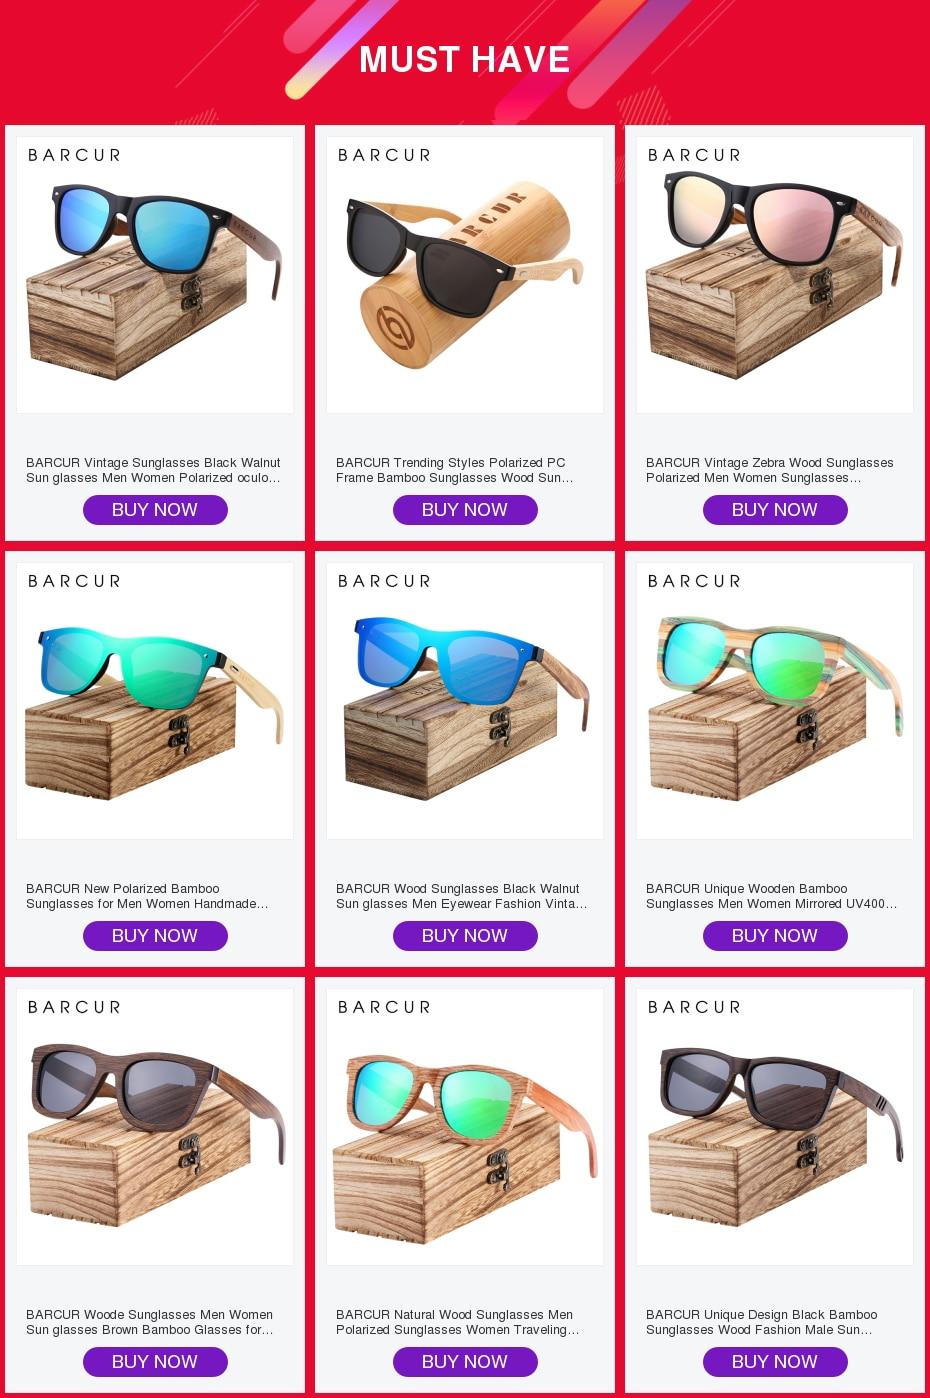 Hbad245cff5cc4507bc819a876dd0060bp BARCUR Natural Wood Sunglasses Men Polarized Sunglasses Women Traveling Vintage glasses oculos de sol